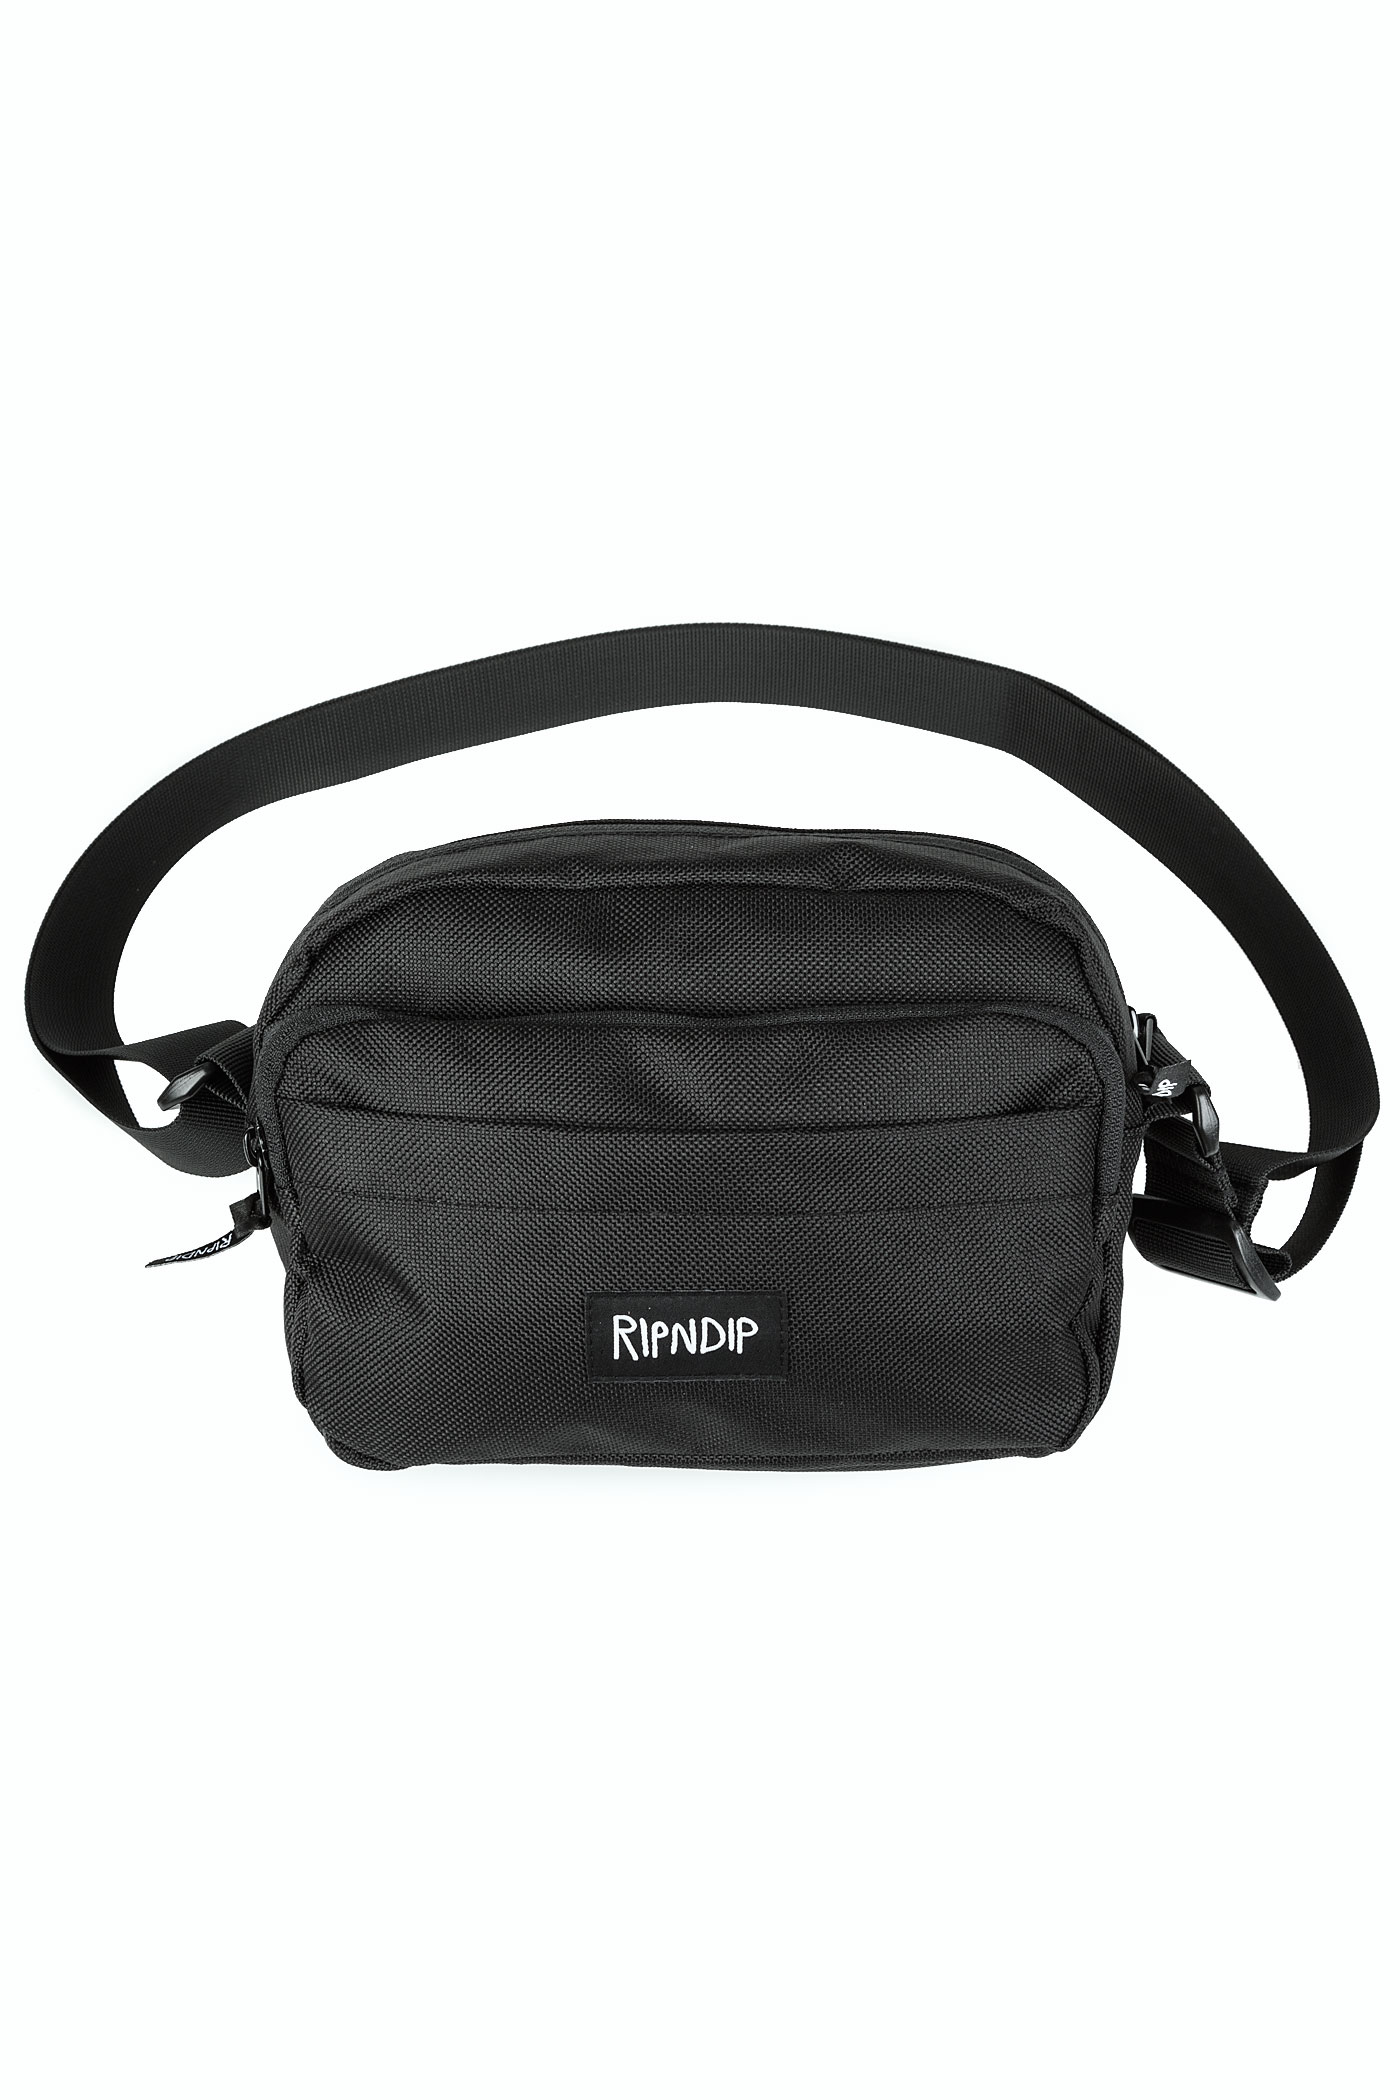 be186bef6fc4 RIPNDIP Man Purse Bag (black) buy at skatedeluxe